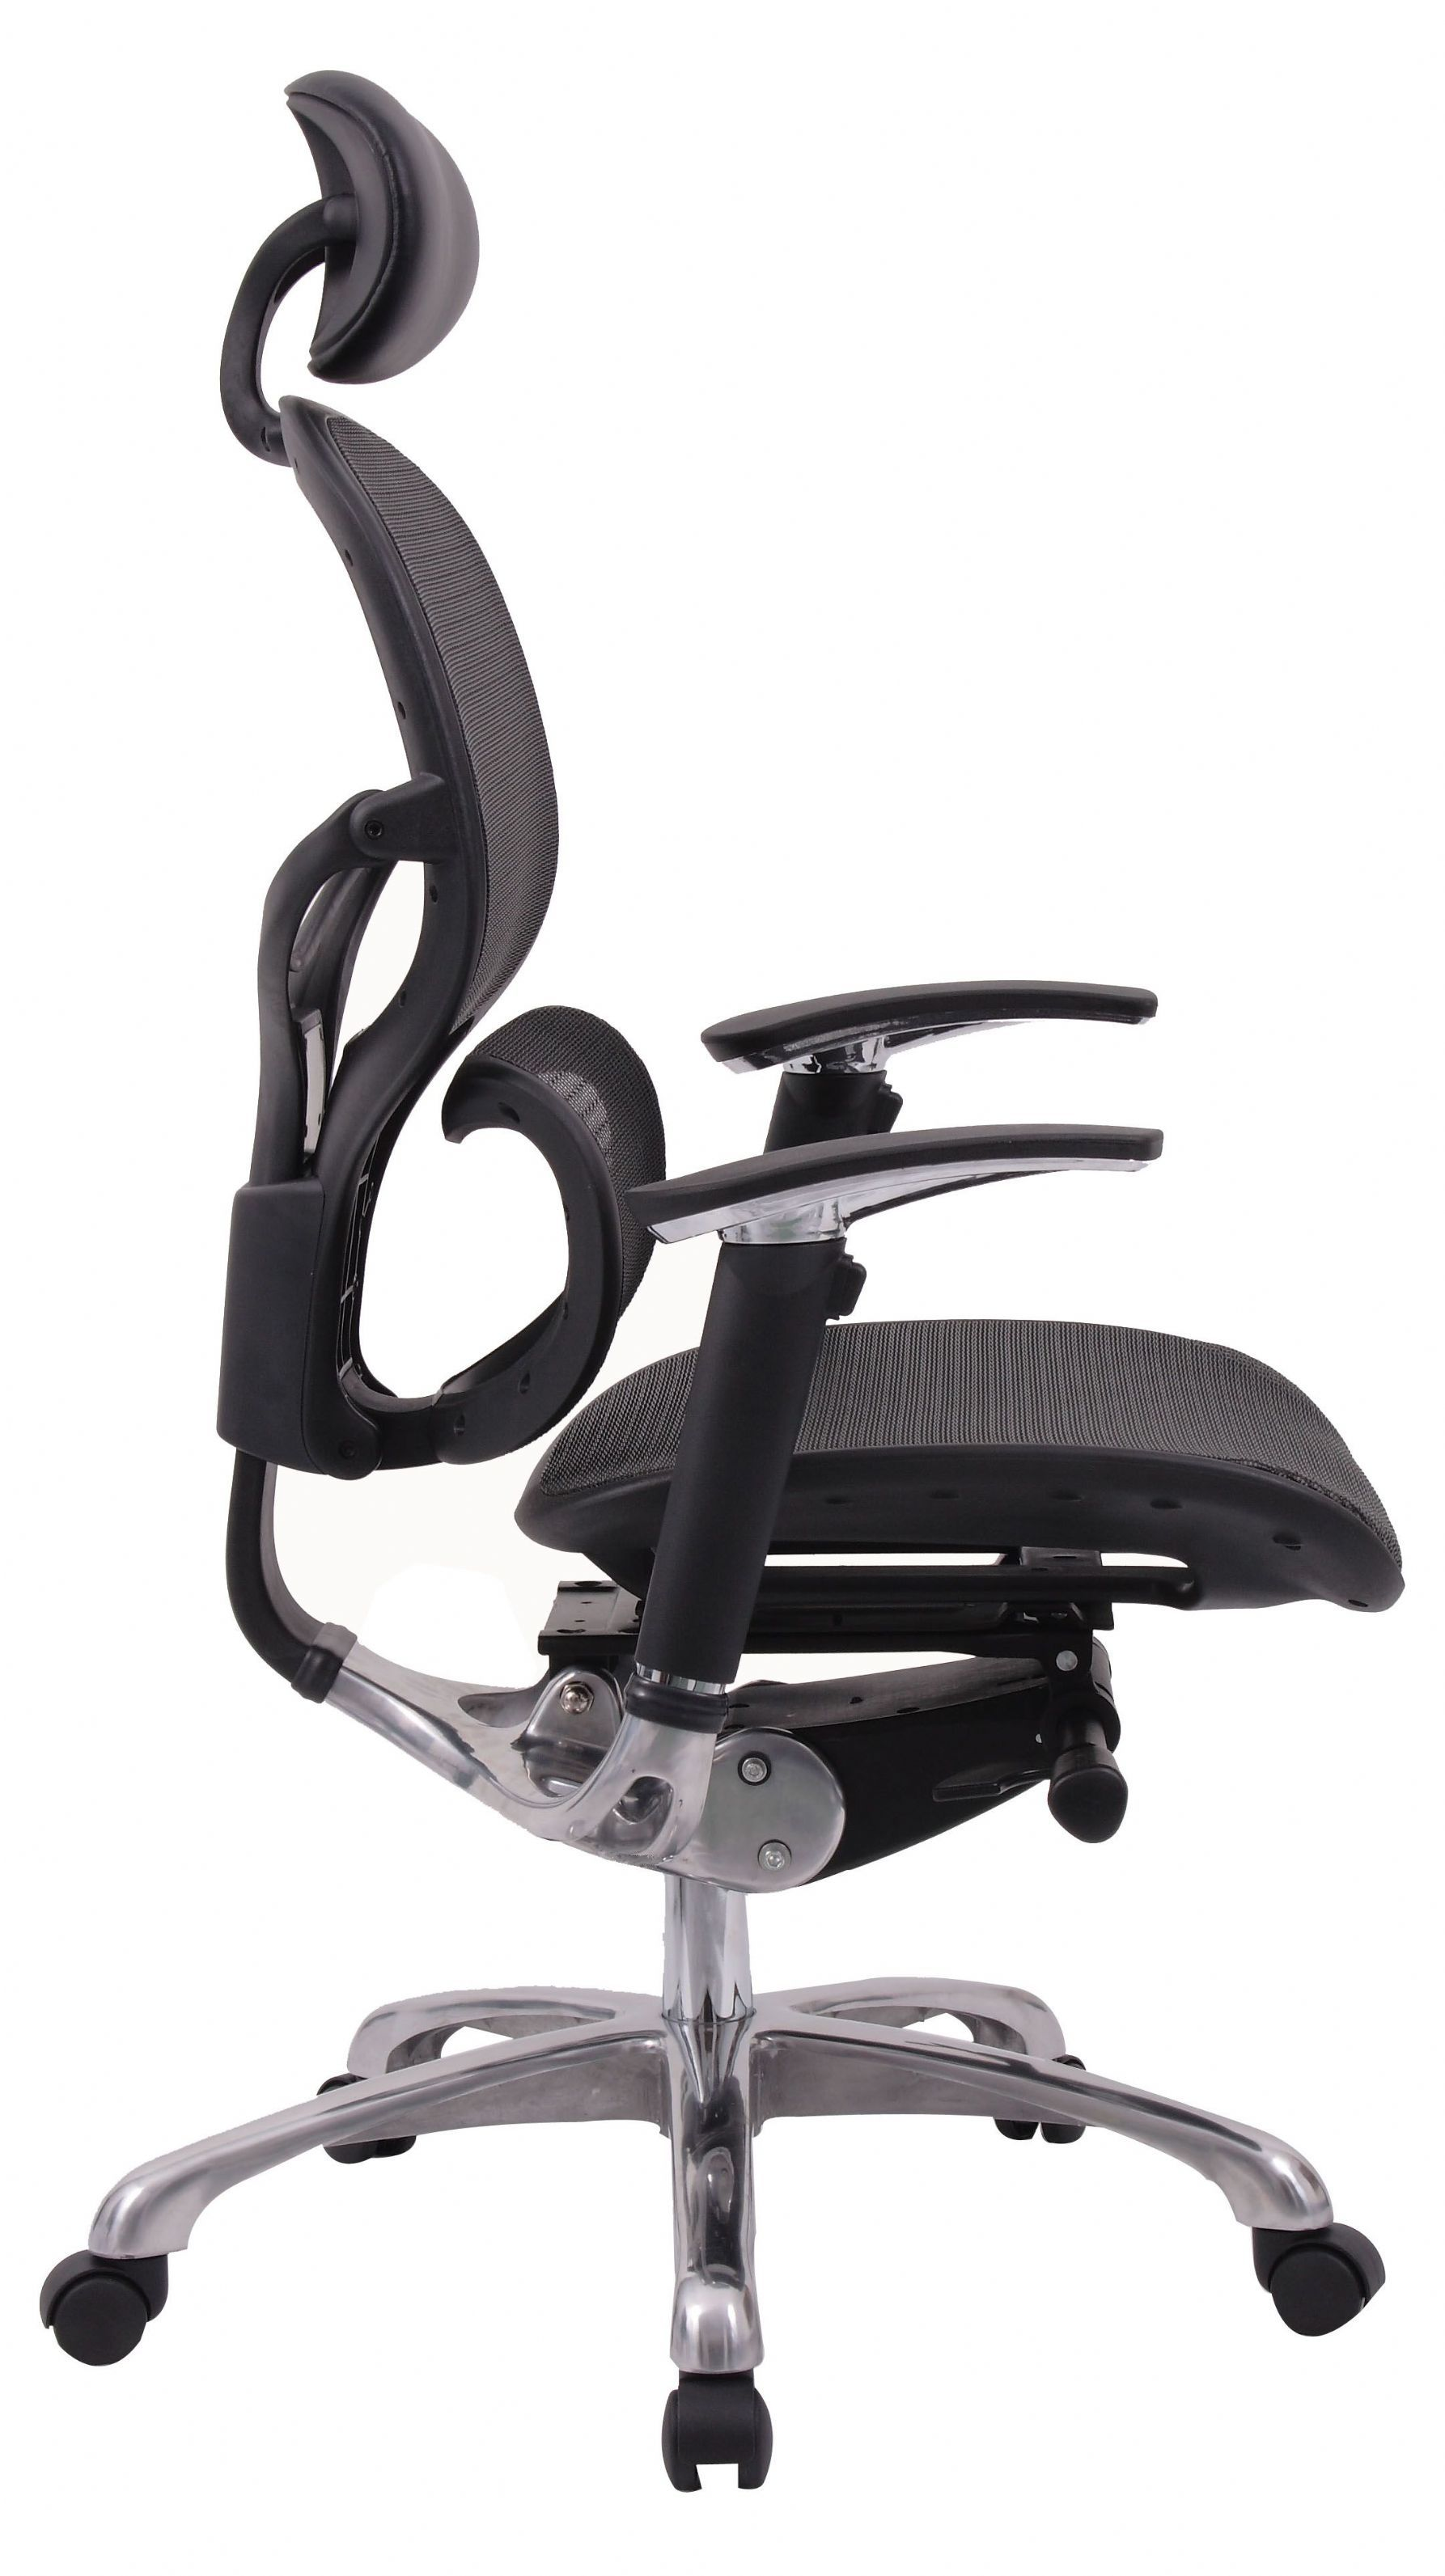 Ergonomic Desk Chair With Lumbar Support Best Office Chair Best Ergonomic Office Chair Office Chair